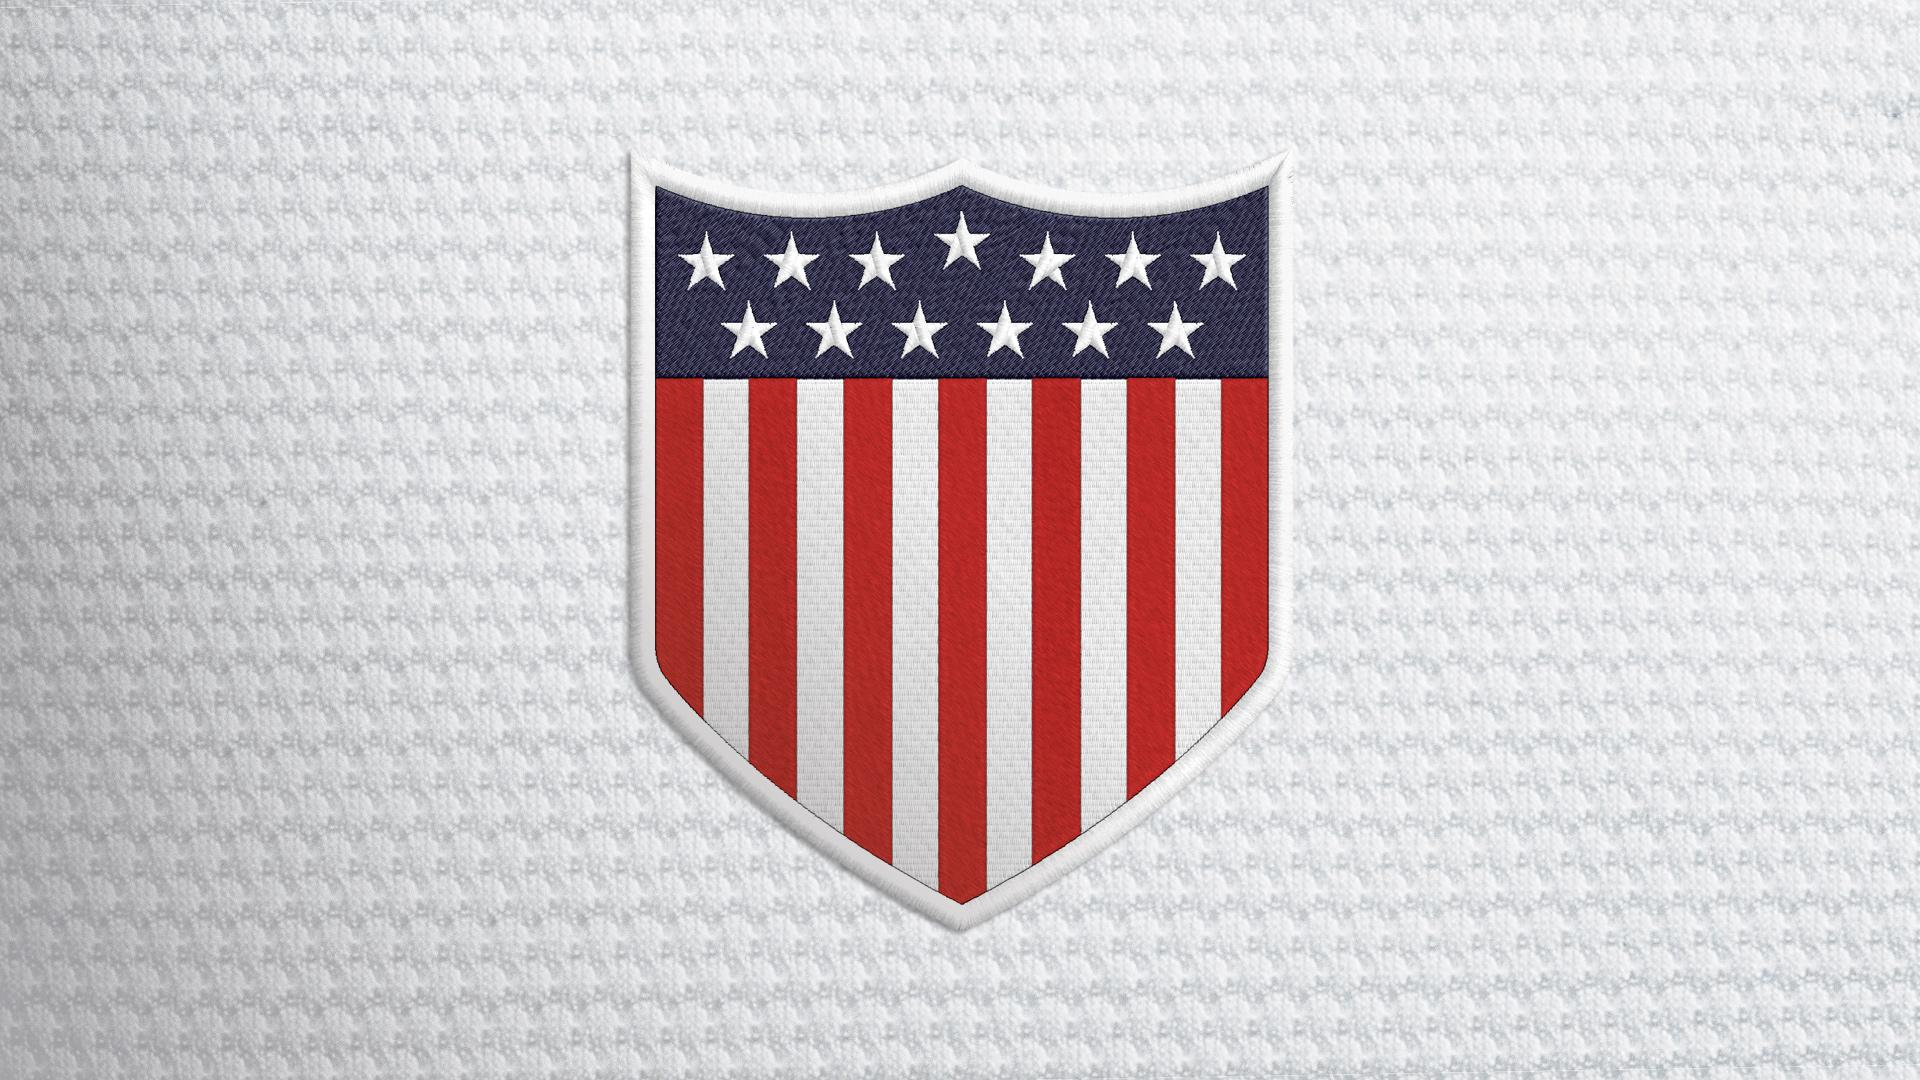 United States Football Wallpaper 1920x1080